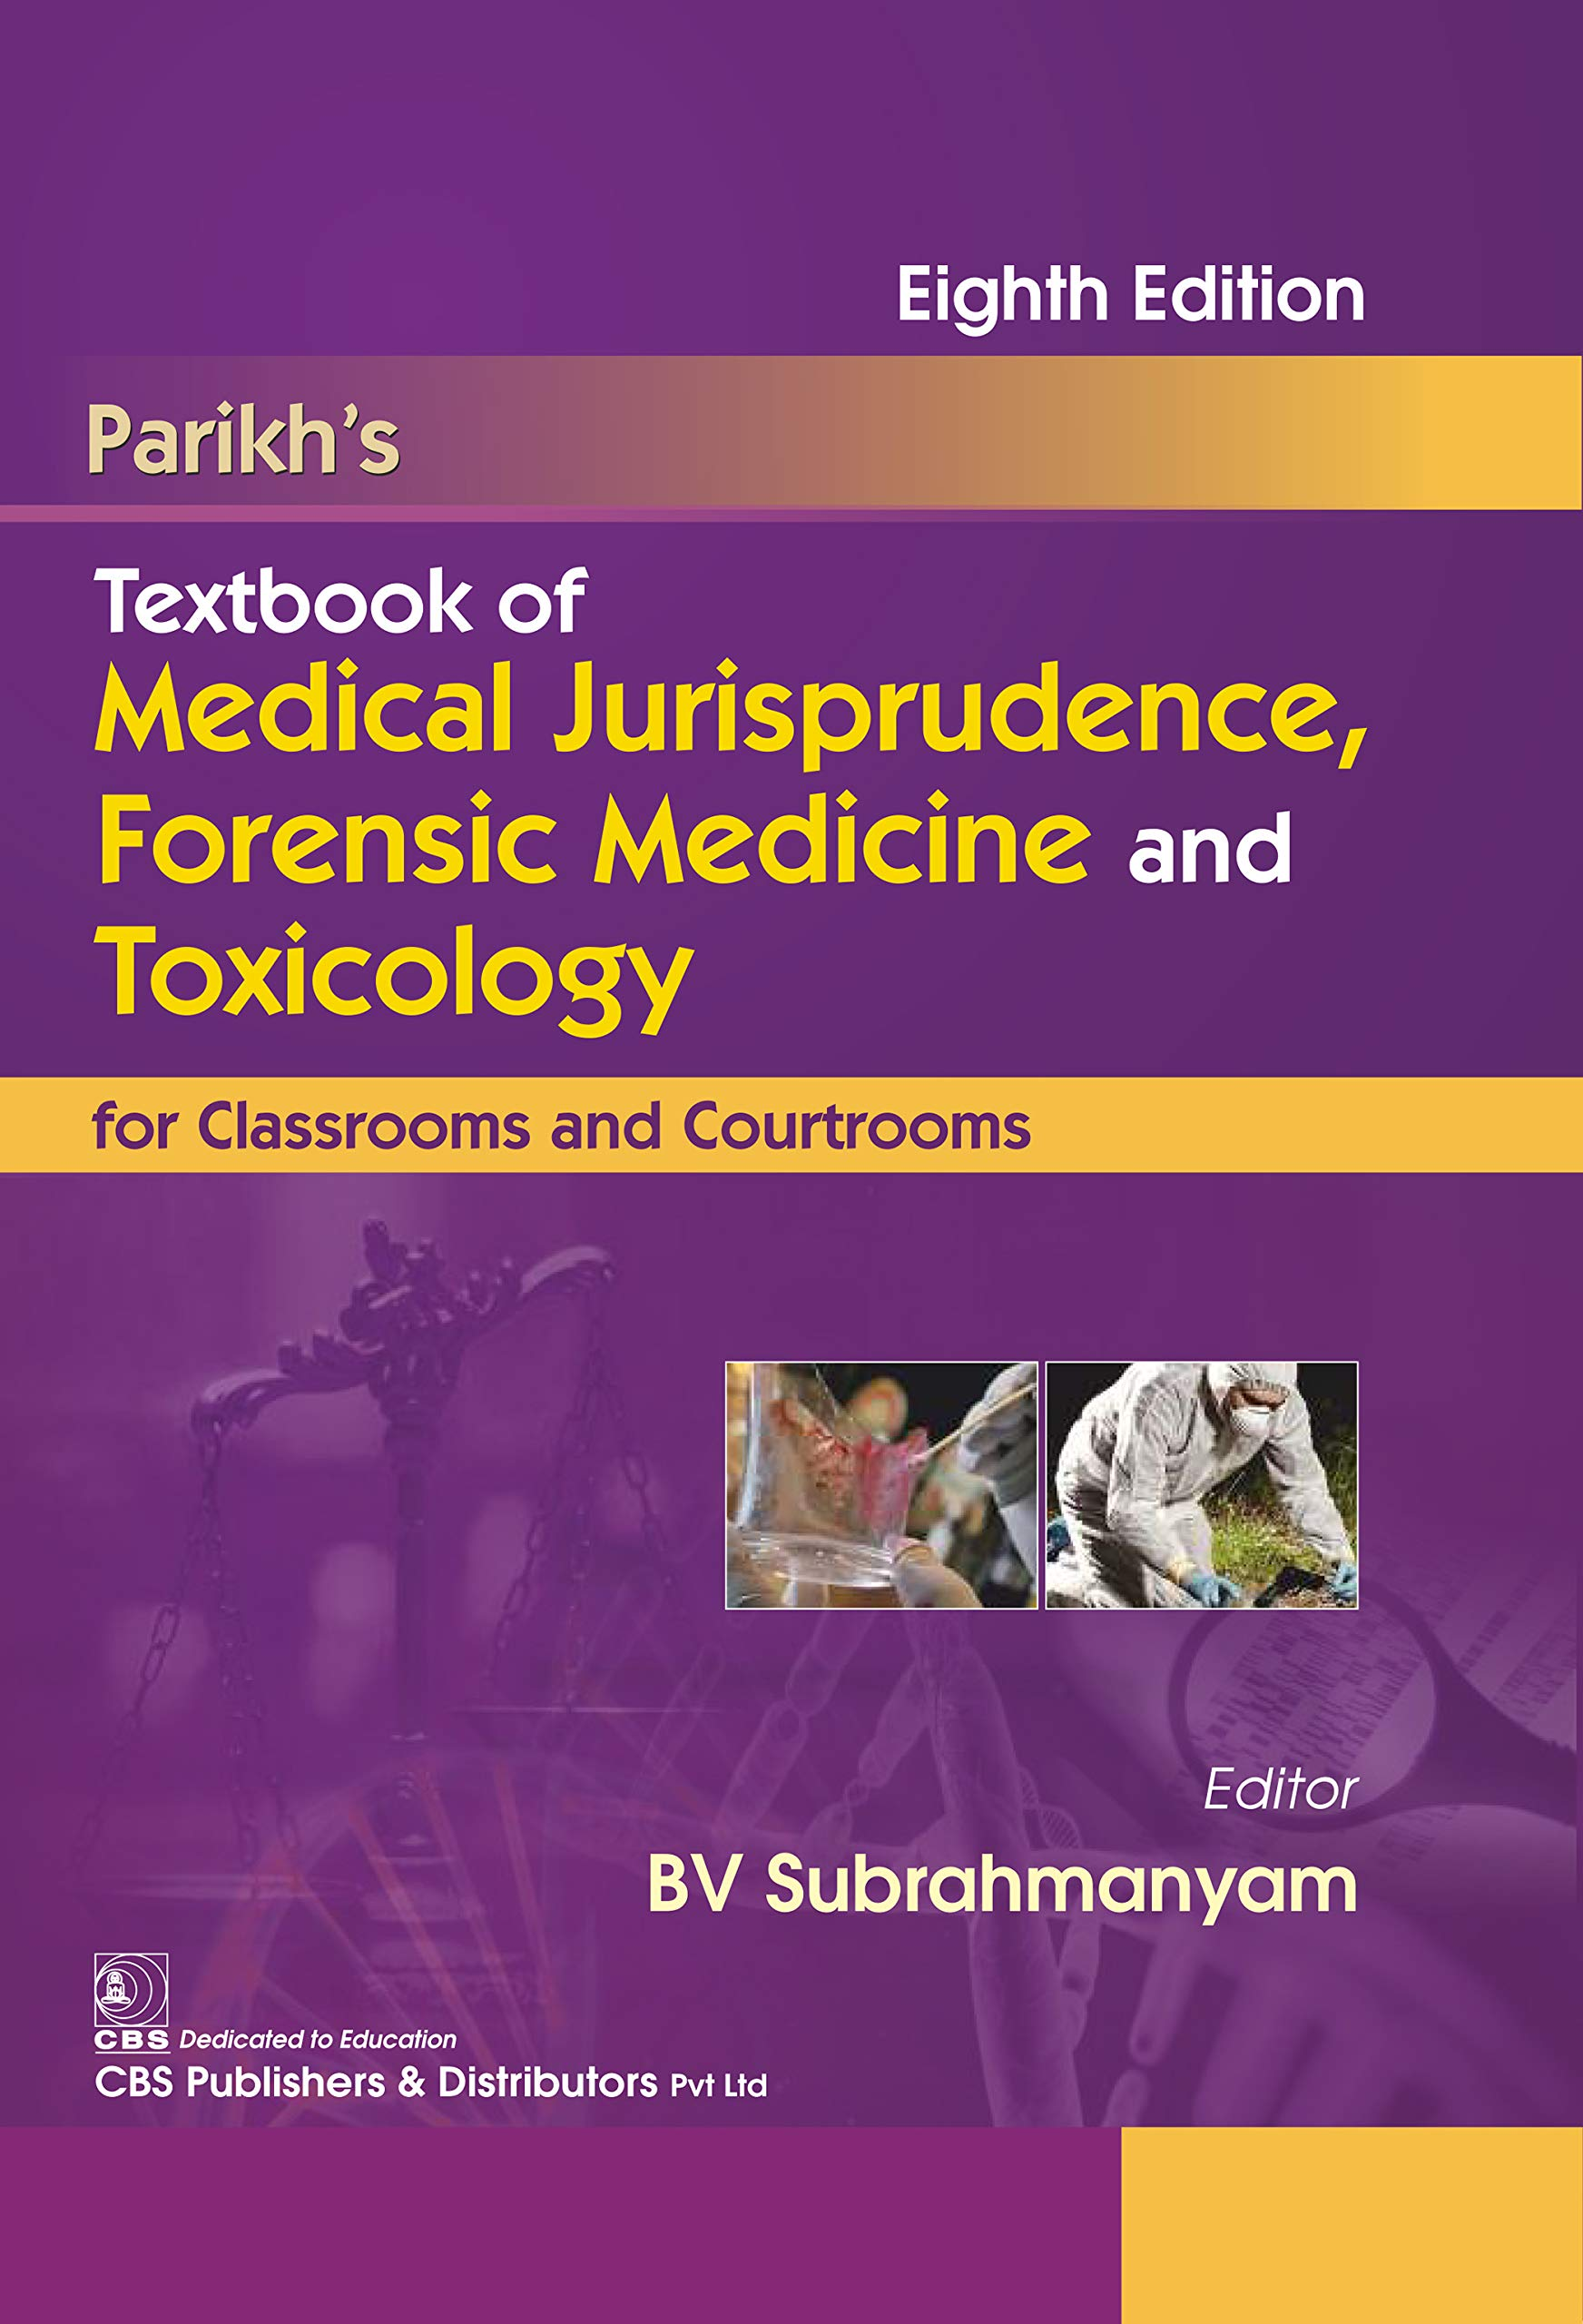 Amazon Com Parikh S Textbook Of Medical Jurisprudence Forensic Medicine And Taxicology Ebook Subrahmanyam B V Kindle Store